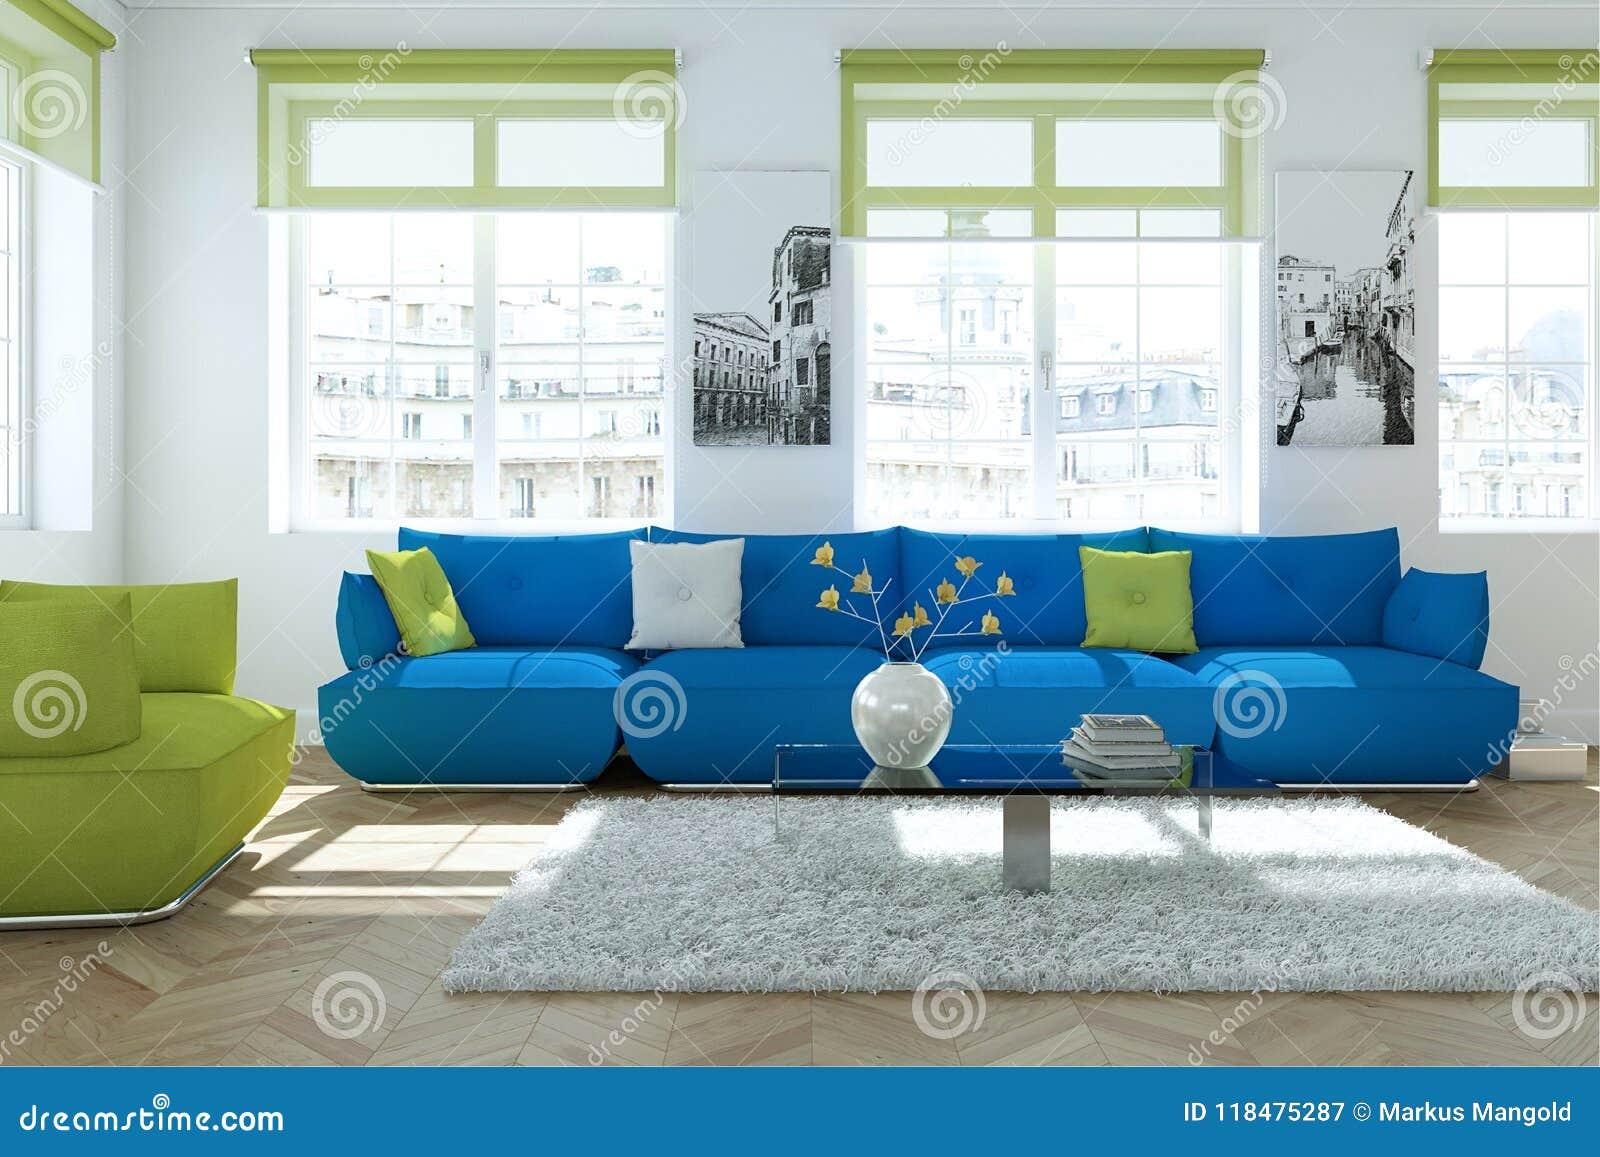 Modern Bright Skandinavian Interior Design Living Room With With Blue Sofas Stock Illustration Illustration Of Modern Loft 118475287